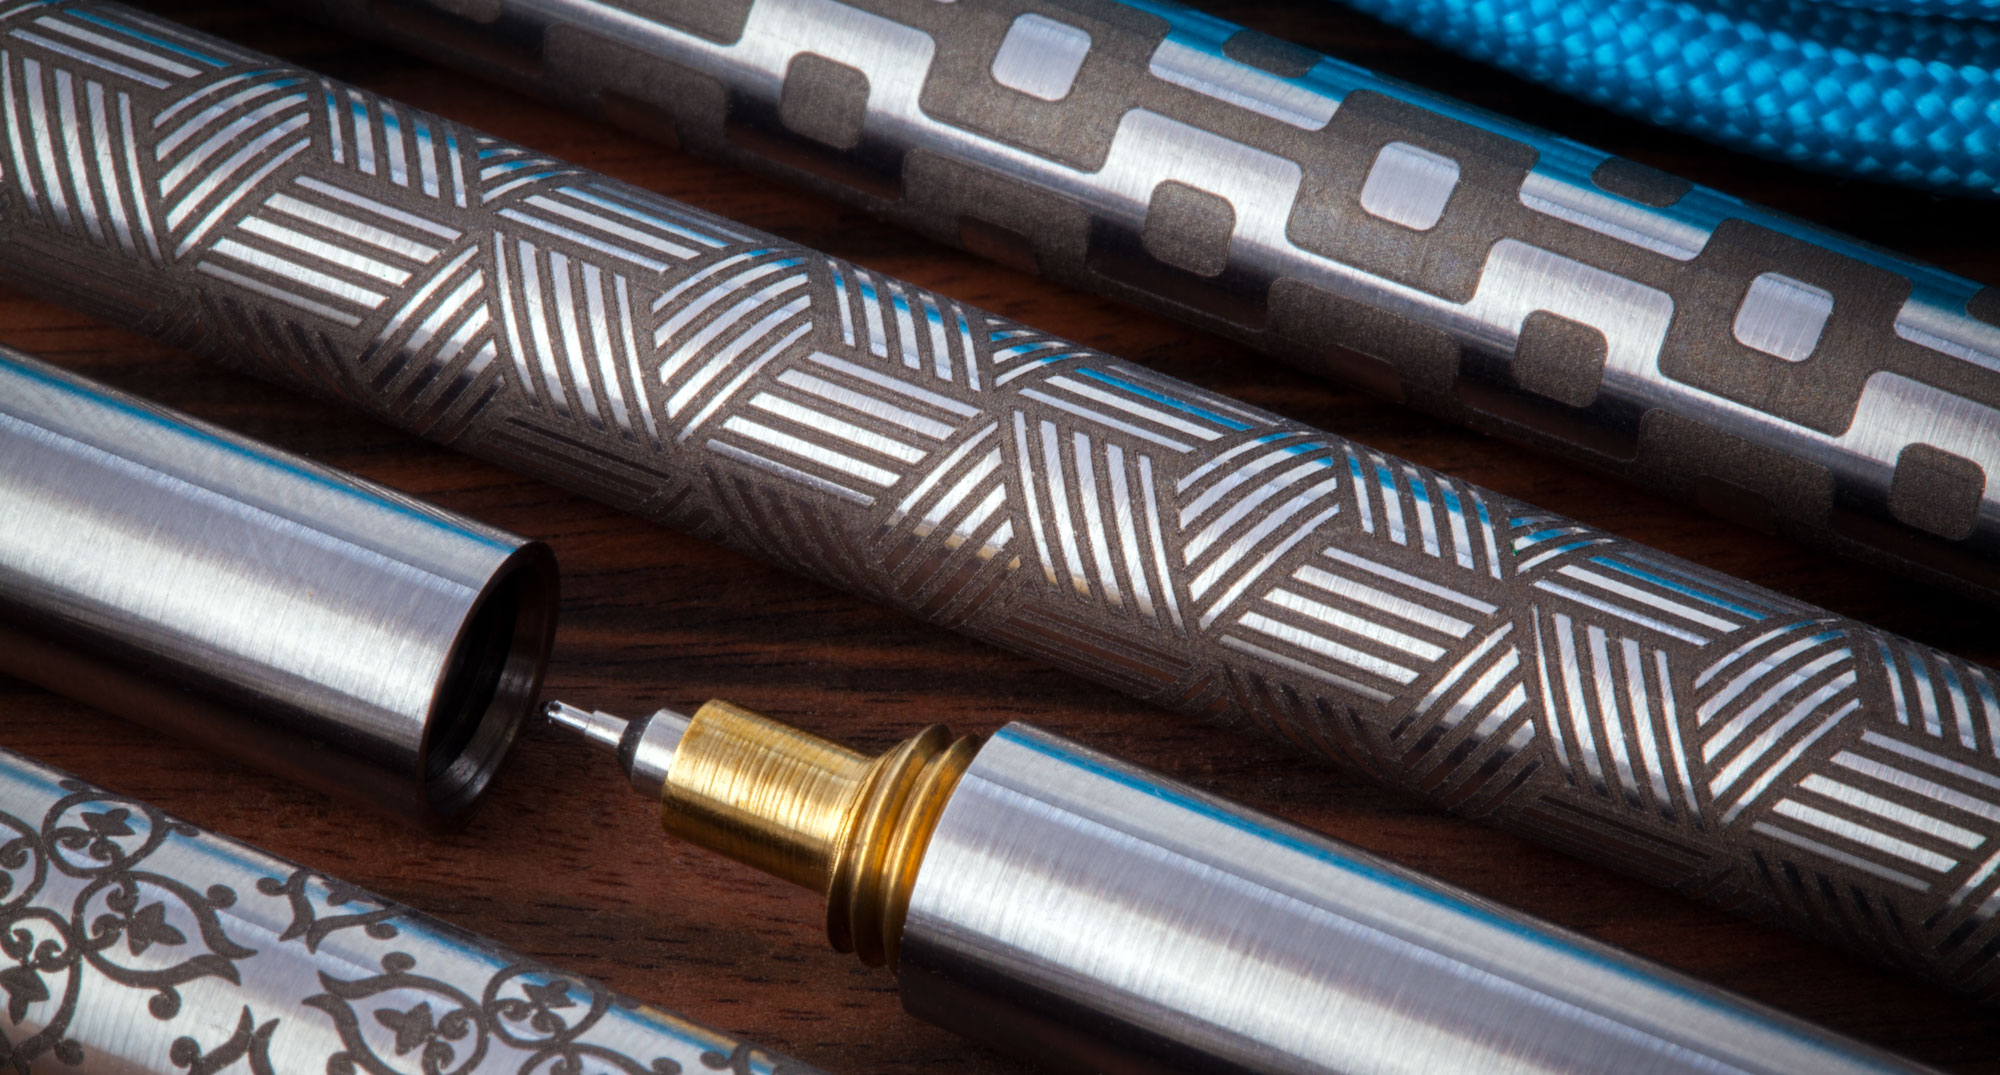 BLANK+FORCES+-+EDC+Ink+Laser+Engraving+Patterns.jpg